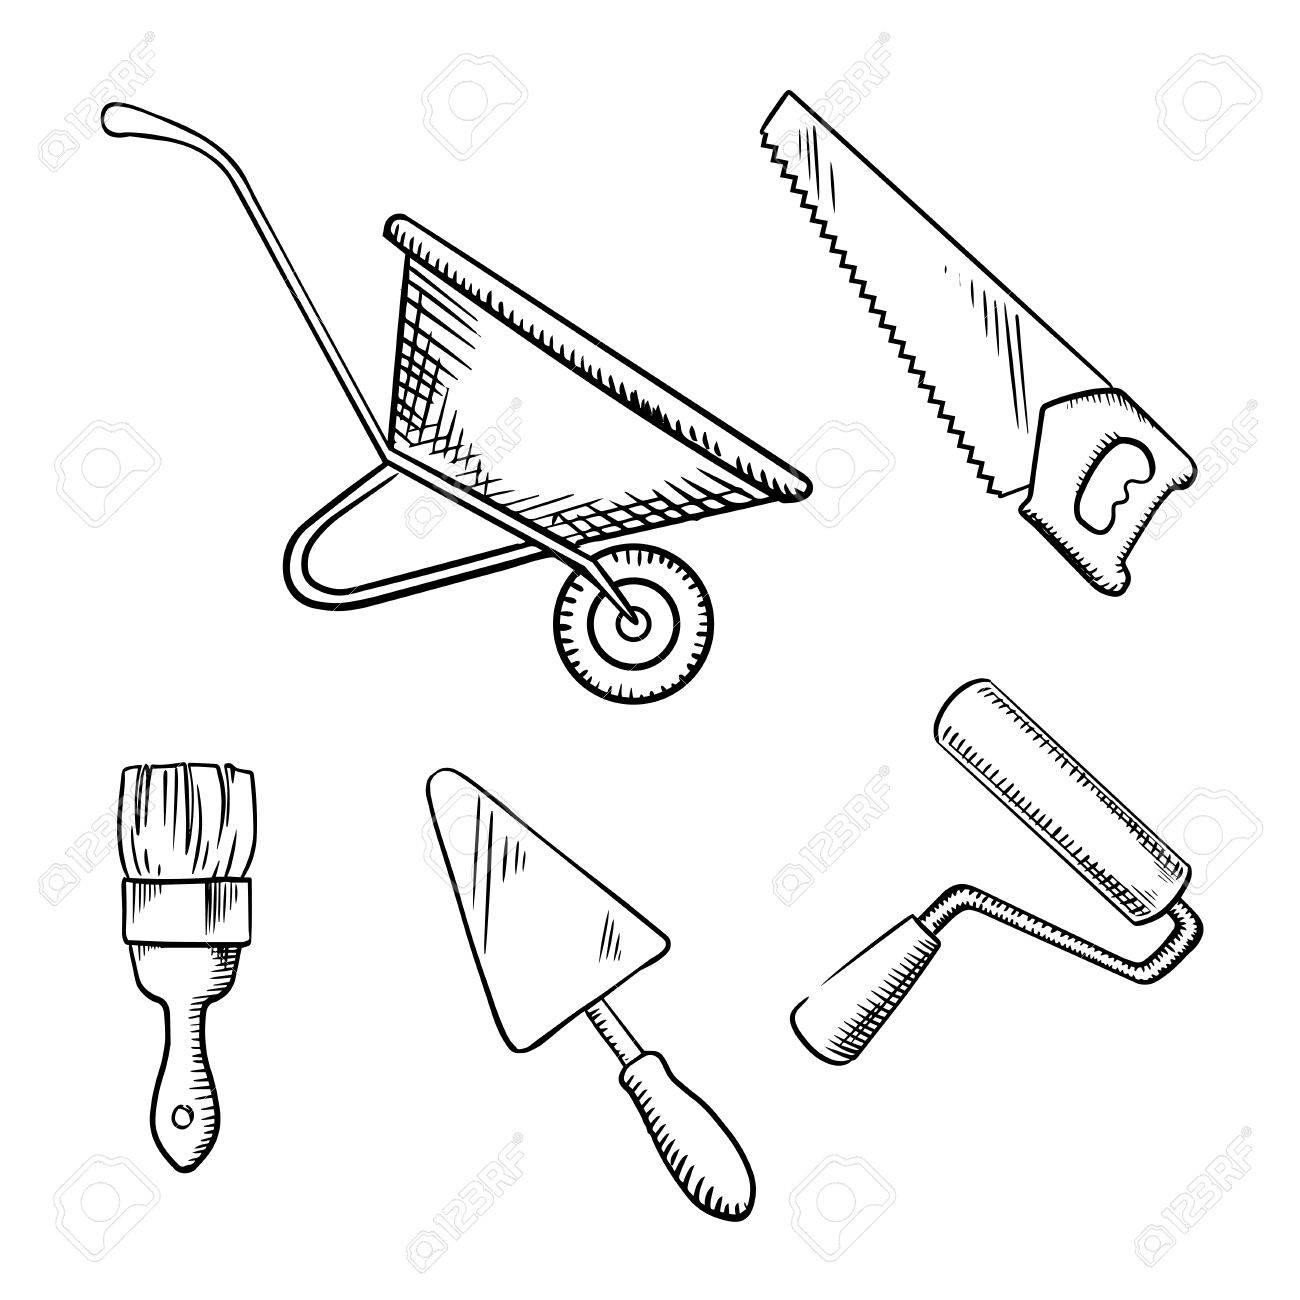 1300x1300 Hand Saw, Trowel, Wheelbarrow, Paint Brush And Roller Sketch